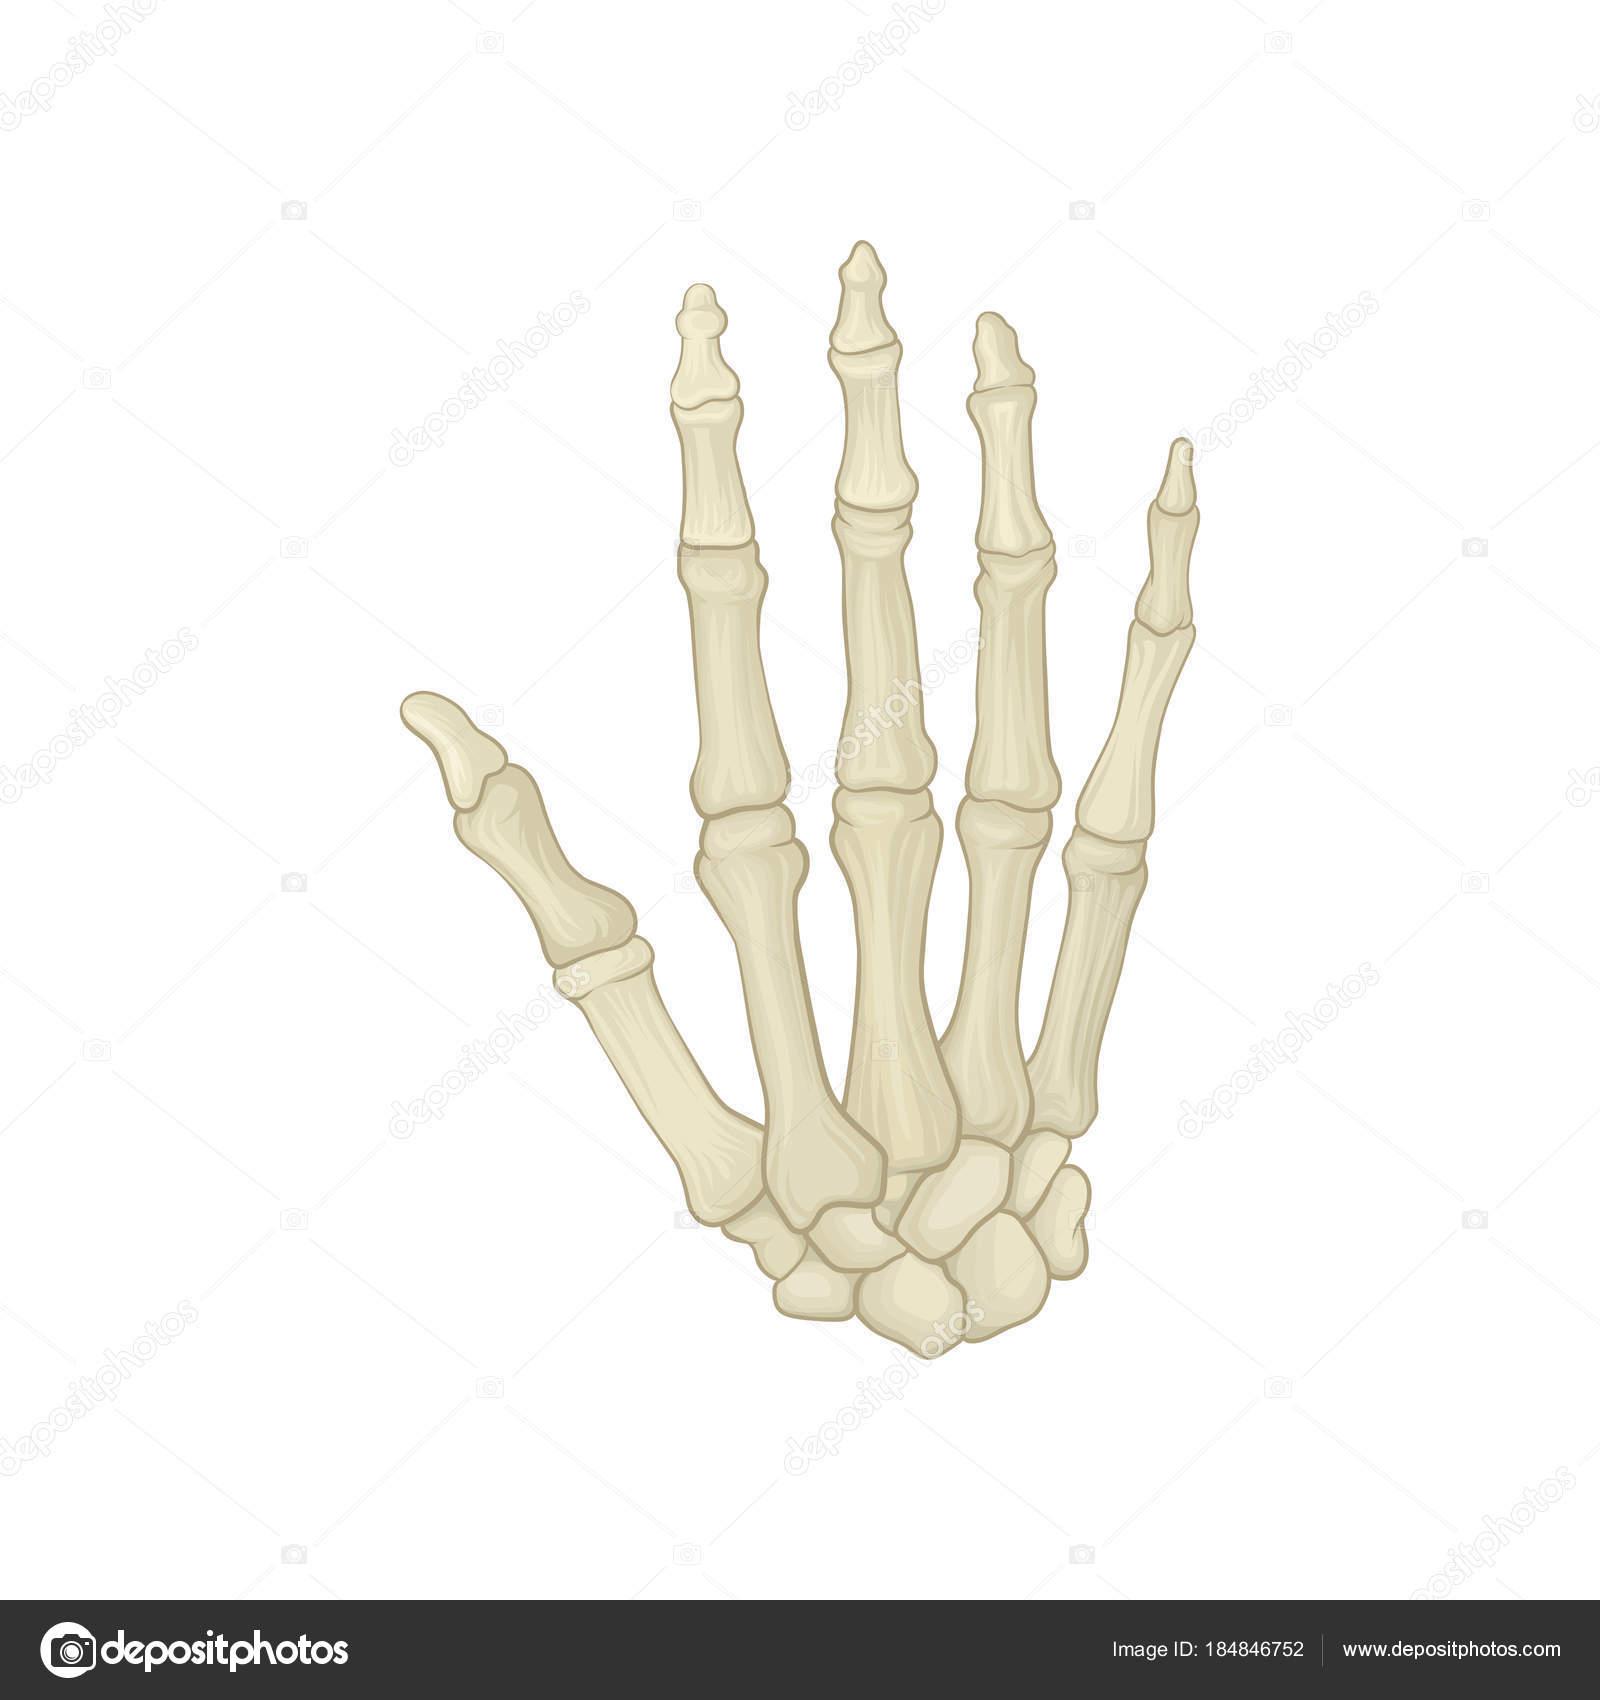 Skeleton Of Human Hand Carpal Bones Metacarpals And Phalanges